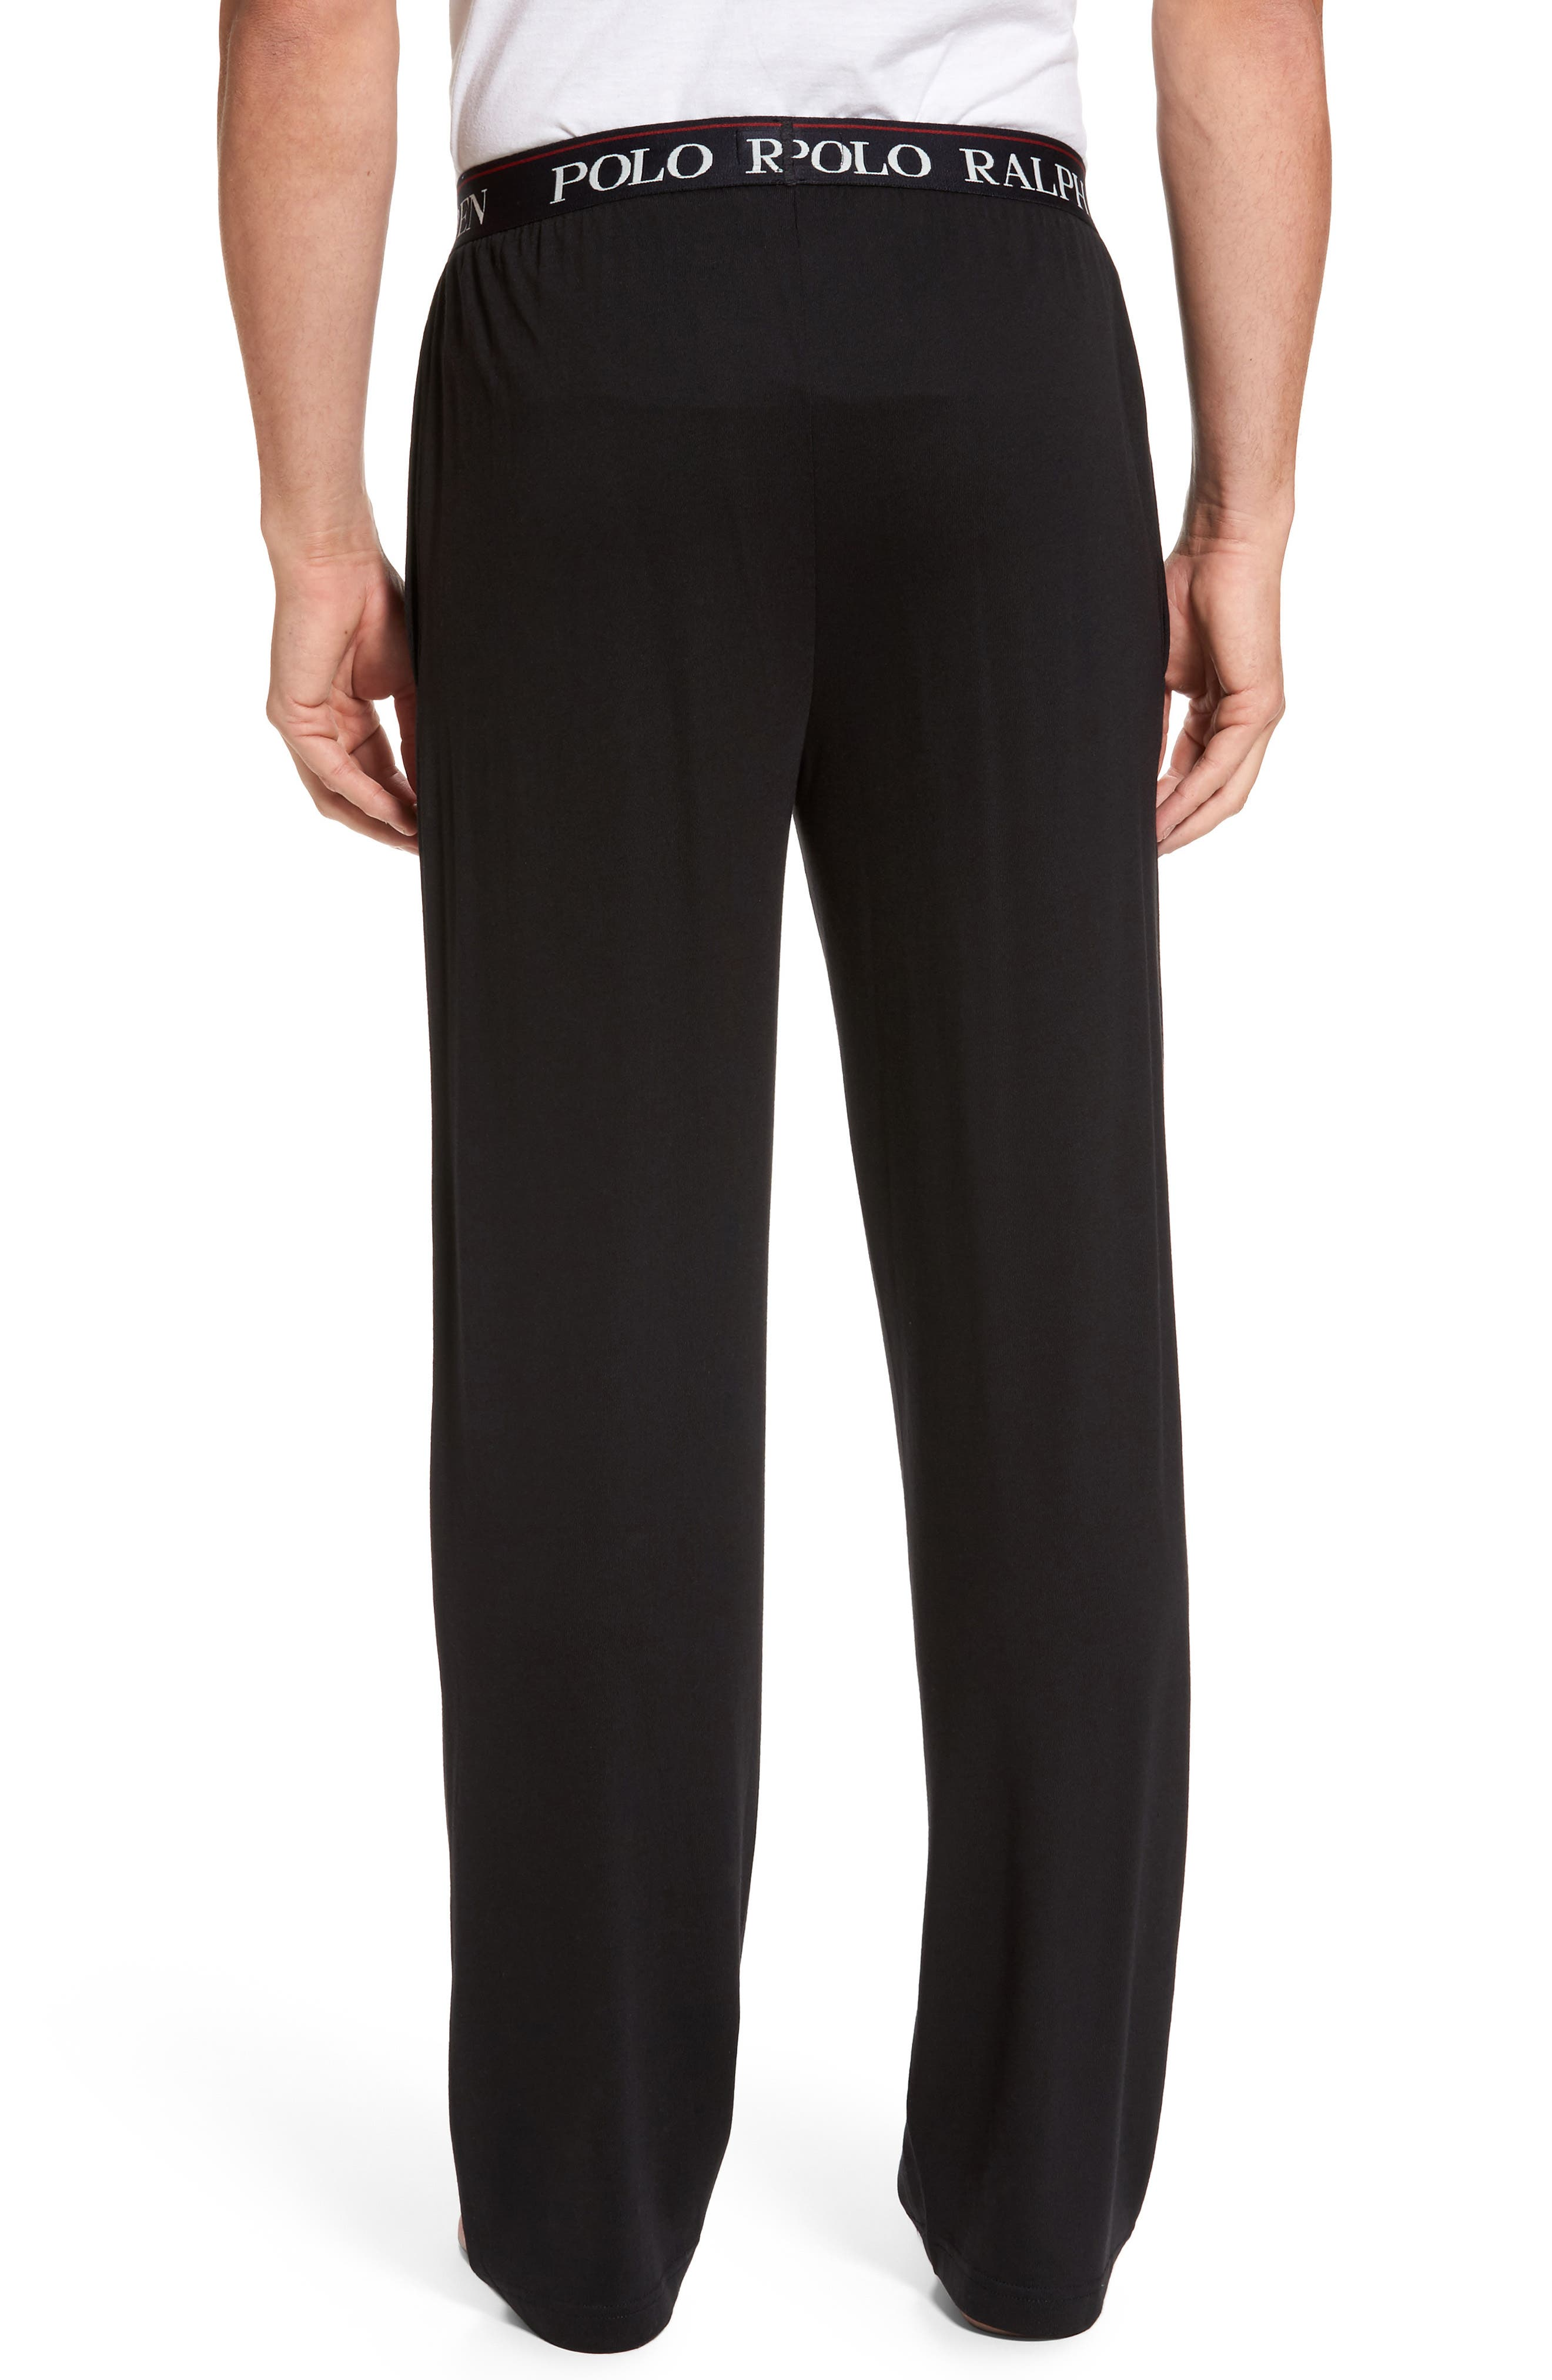 Cotton & Modal Lounge Pants,                             Alternate thumbnail 2, color,                             POLO BLACK